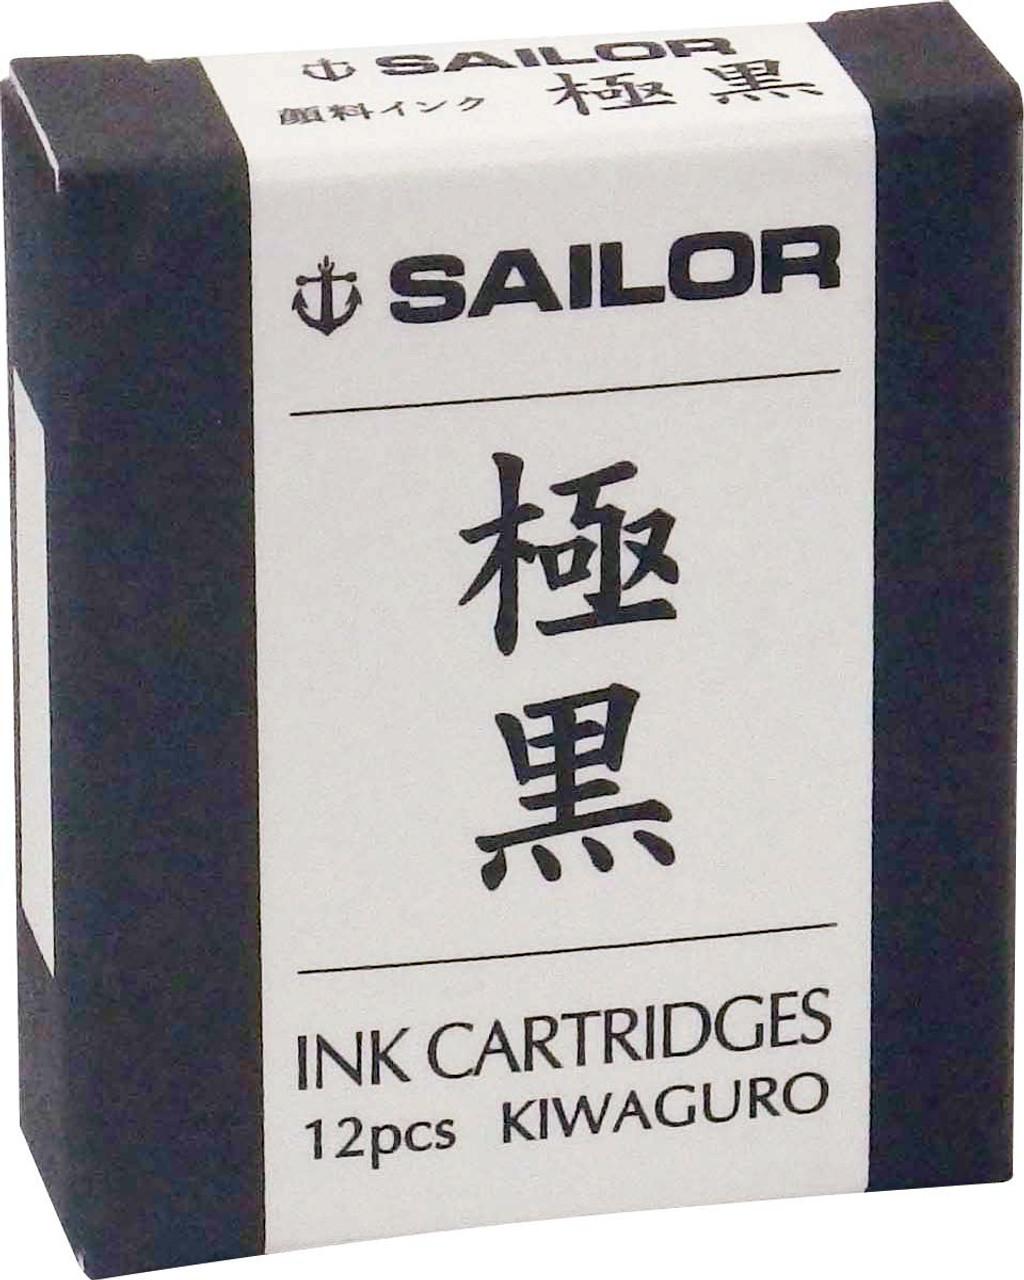 Sailor Fountain Pen Pack Of 12 Kiwaguro Pigment Black Ink Cartridges